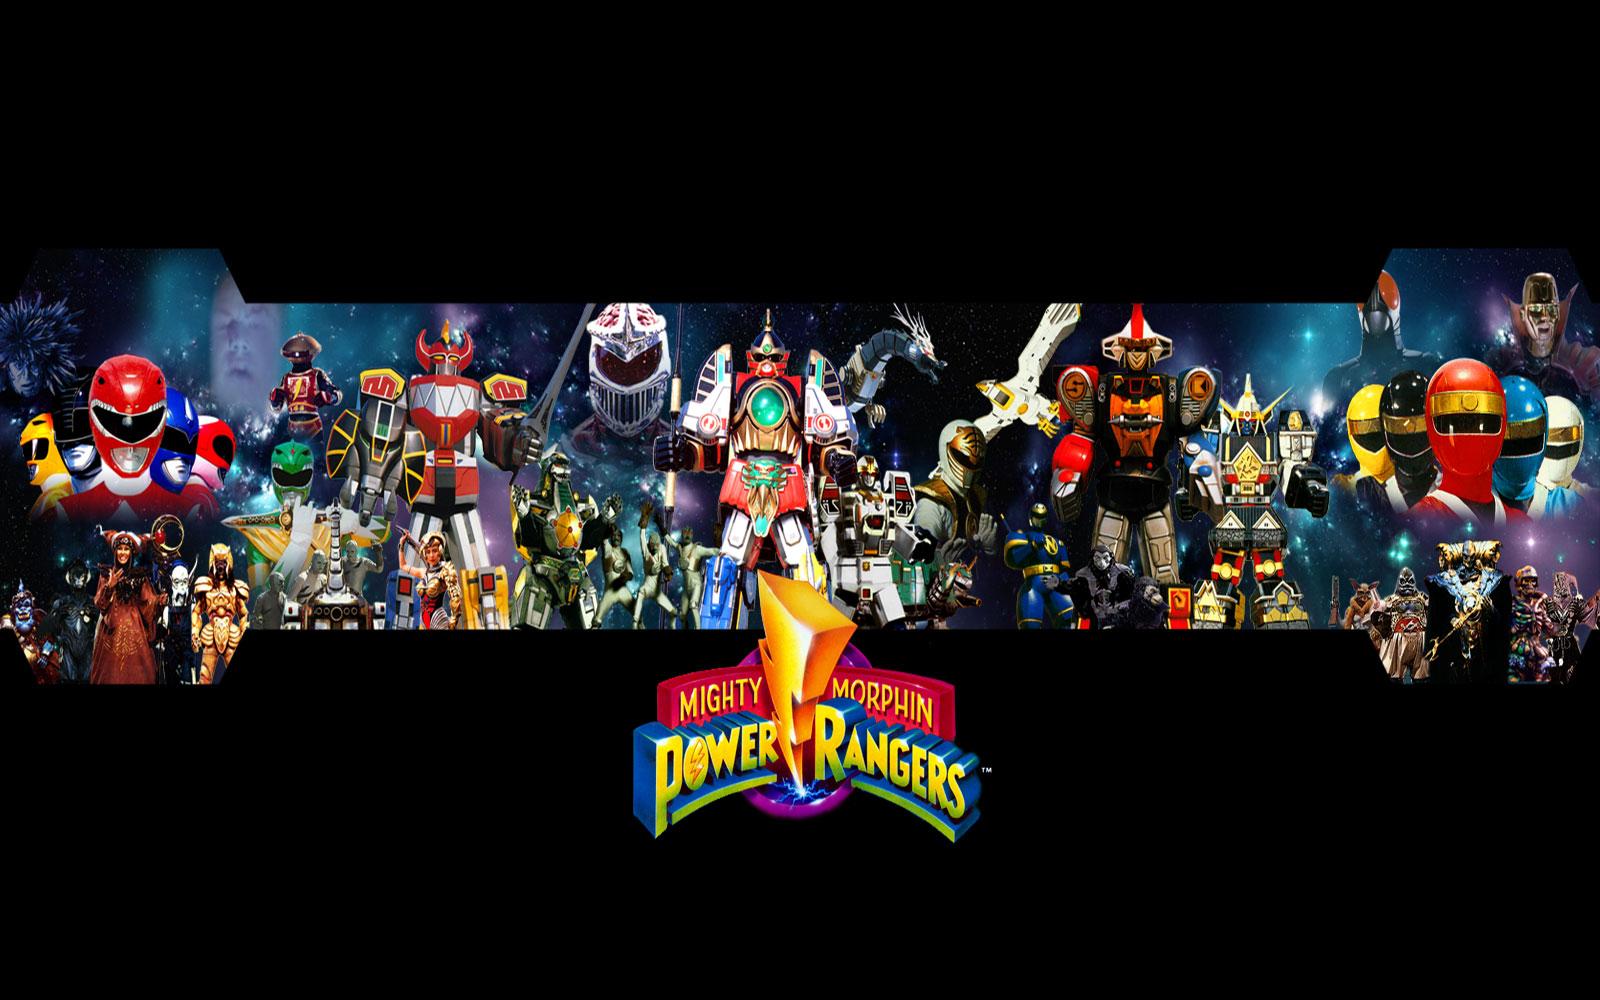 http://1.bp.blogspot.com/-hI5V-YmozDg/TnMUtw6mQtI/AAAAAAAAABA/quctwofe5sg/s1600/Mighty-Morphin-Power-Rangers-Widescreen-Wallpaper.jpg